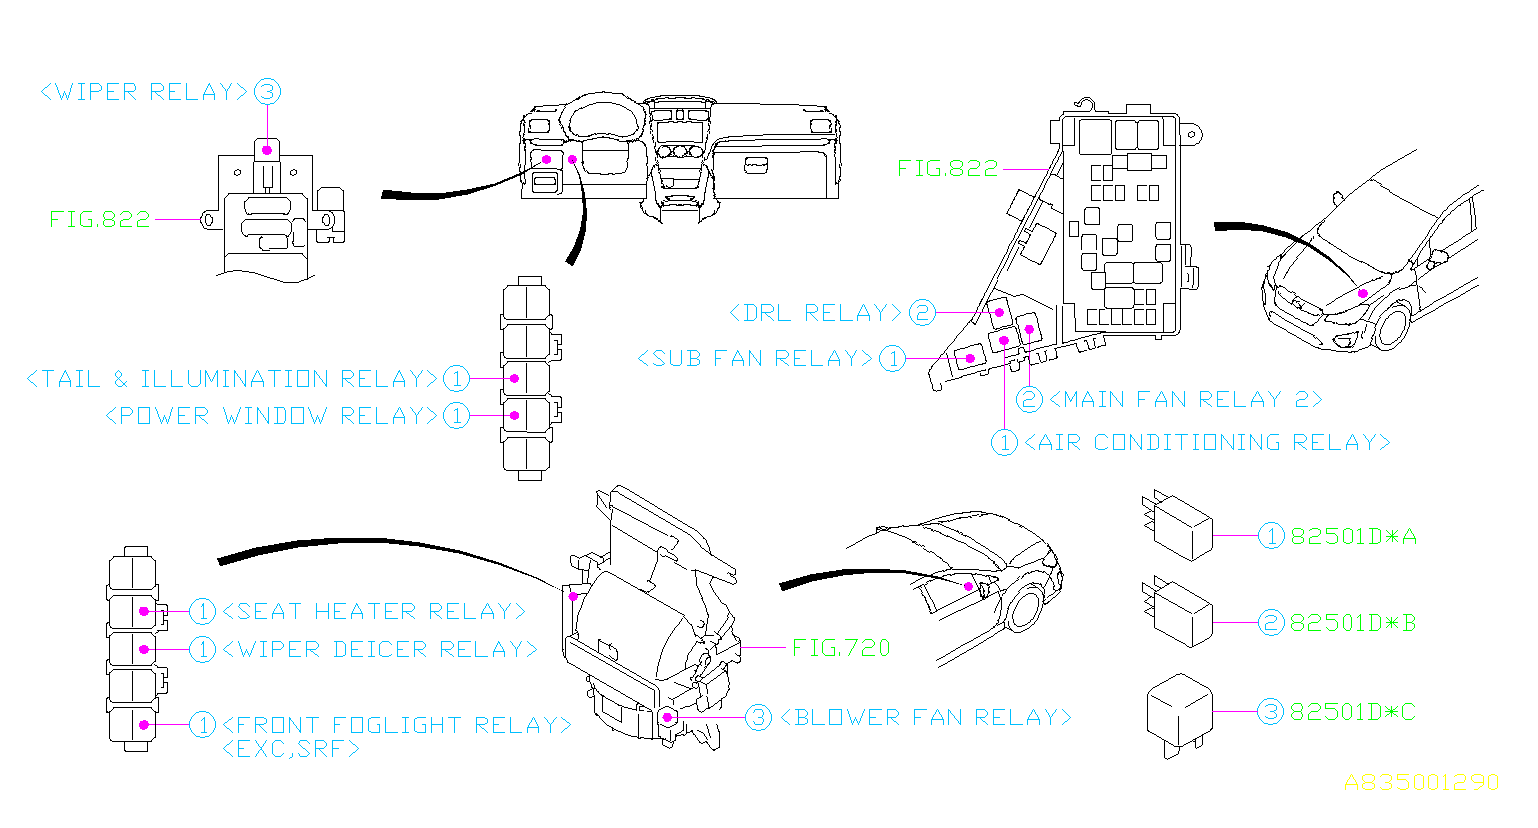 Subaru Impreza Accessory Power Relay. FUSE, BOX ...